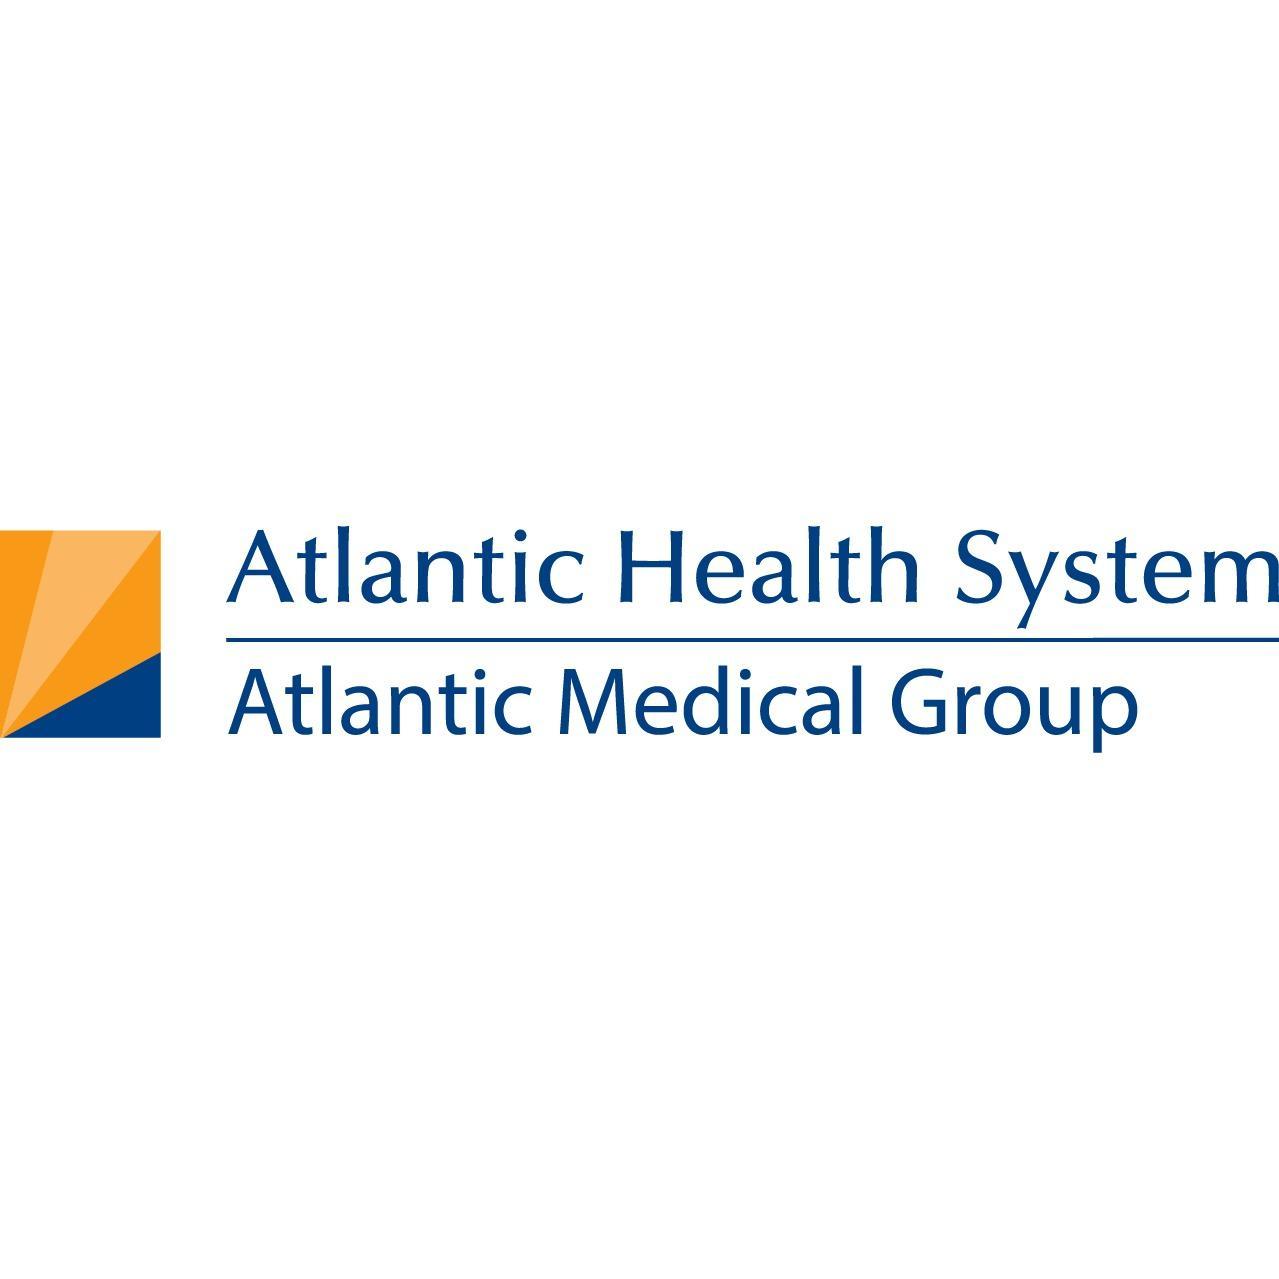 James Alexander - Atlantic Medical Group Endovascular Surgery at Raritan - Raritan, NJ 08869 - (908)947-2714 | ShowMeLocal.com